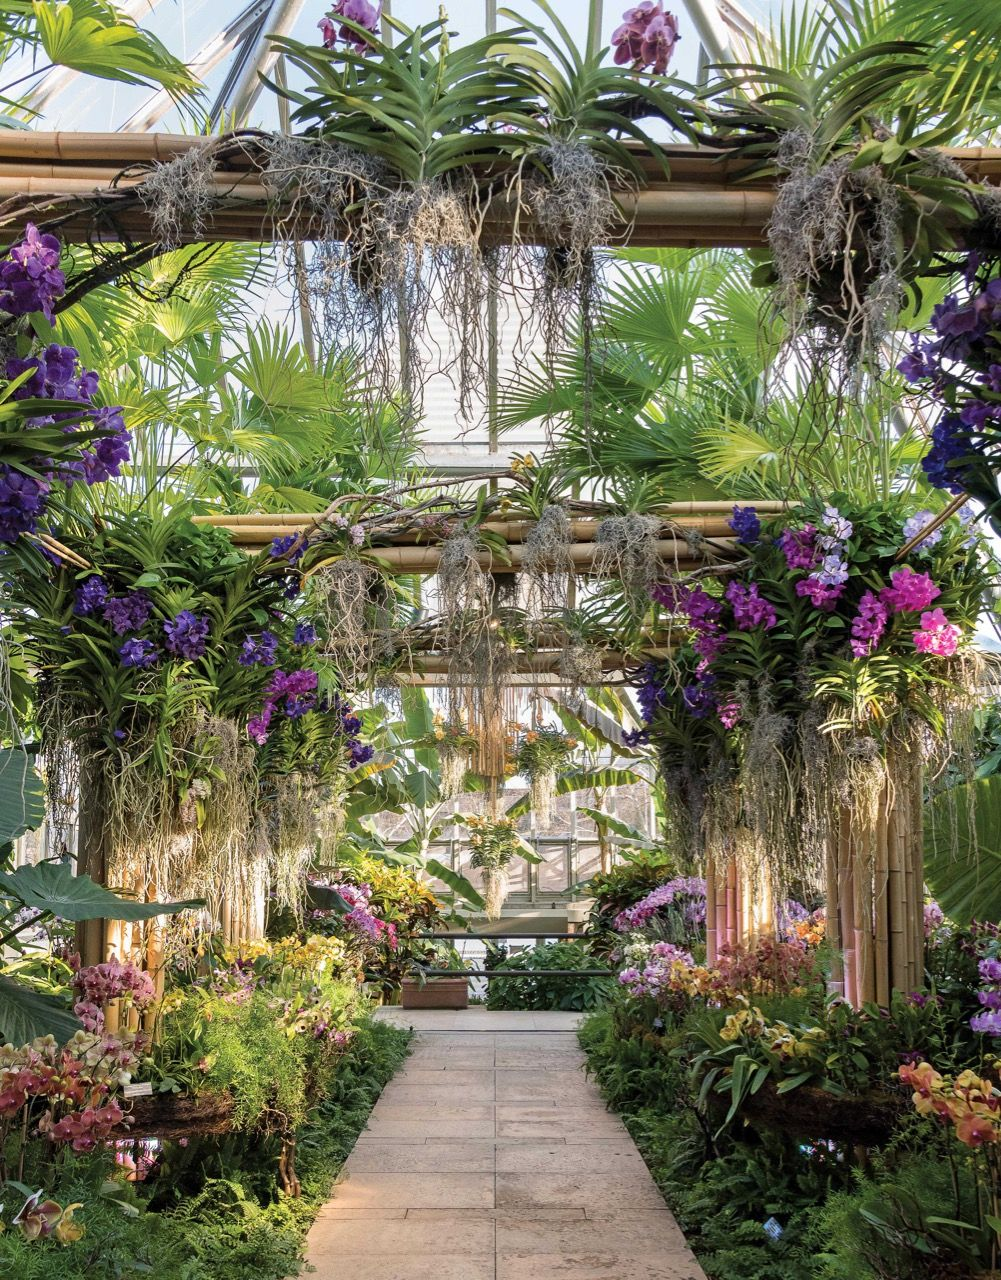 Escape to the tropics at the Chicago Botanic Garden Orchid Show #botanicgarden